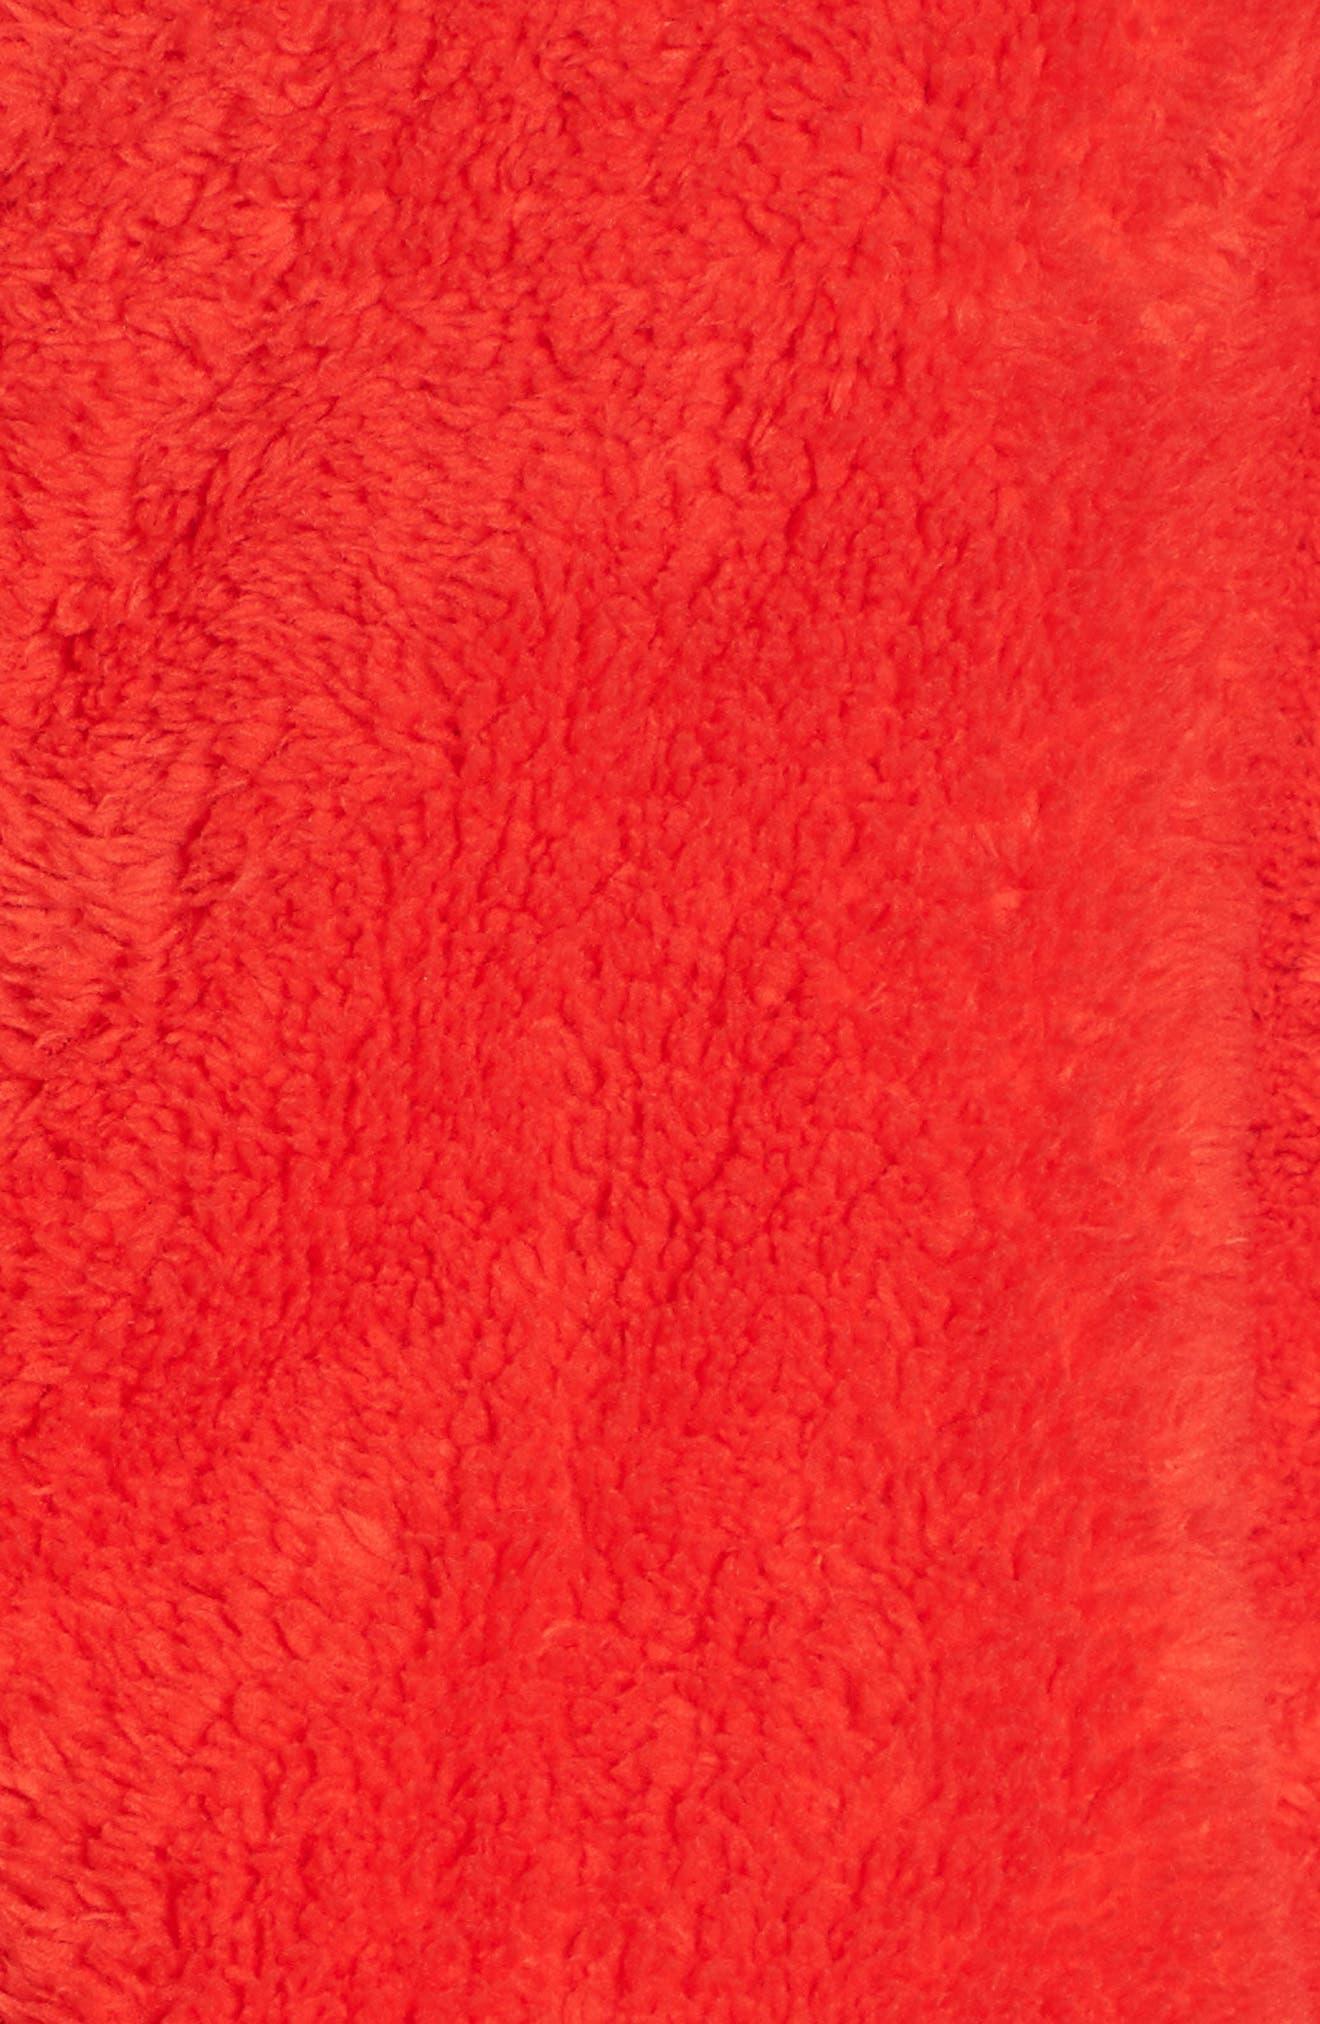 Dazed Fleece Jacket,                             Alternate thumbnail 6, color,                             RED